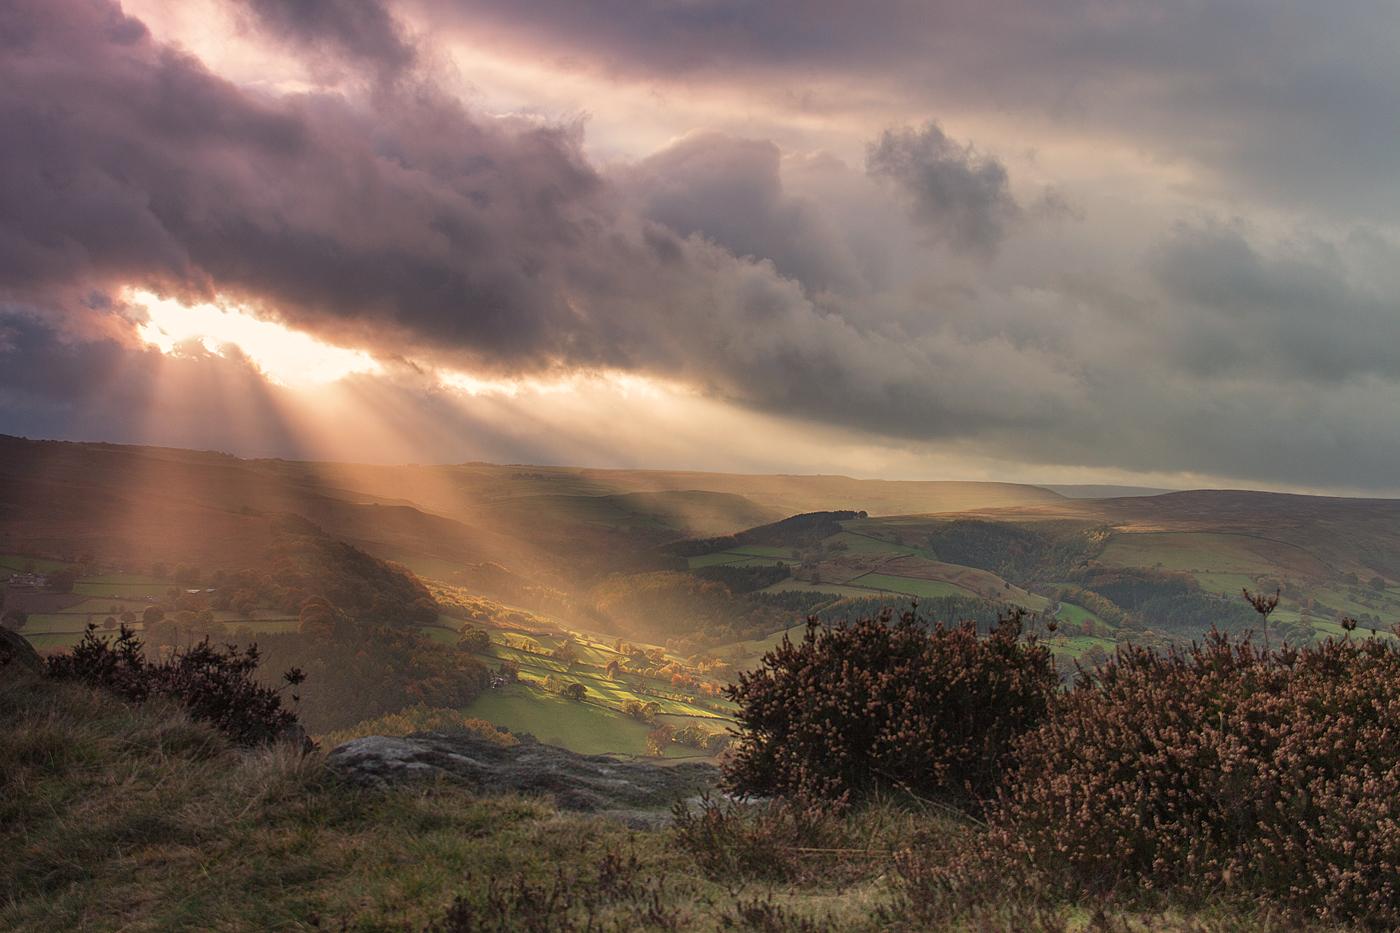 Millstone Edge: Shafts of Light